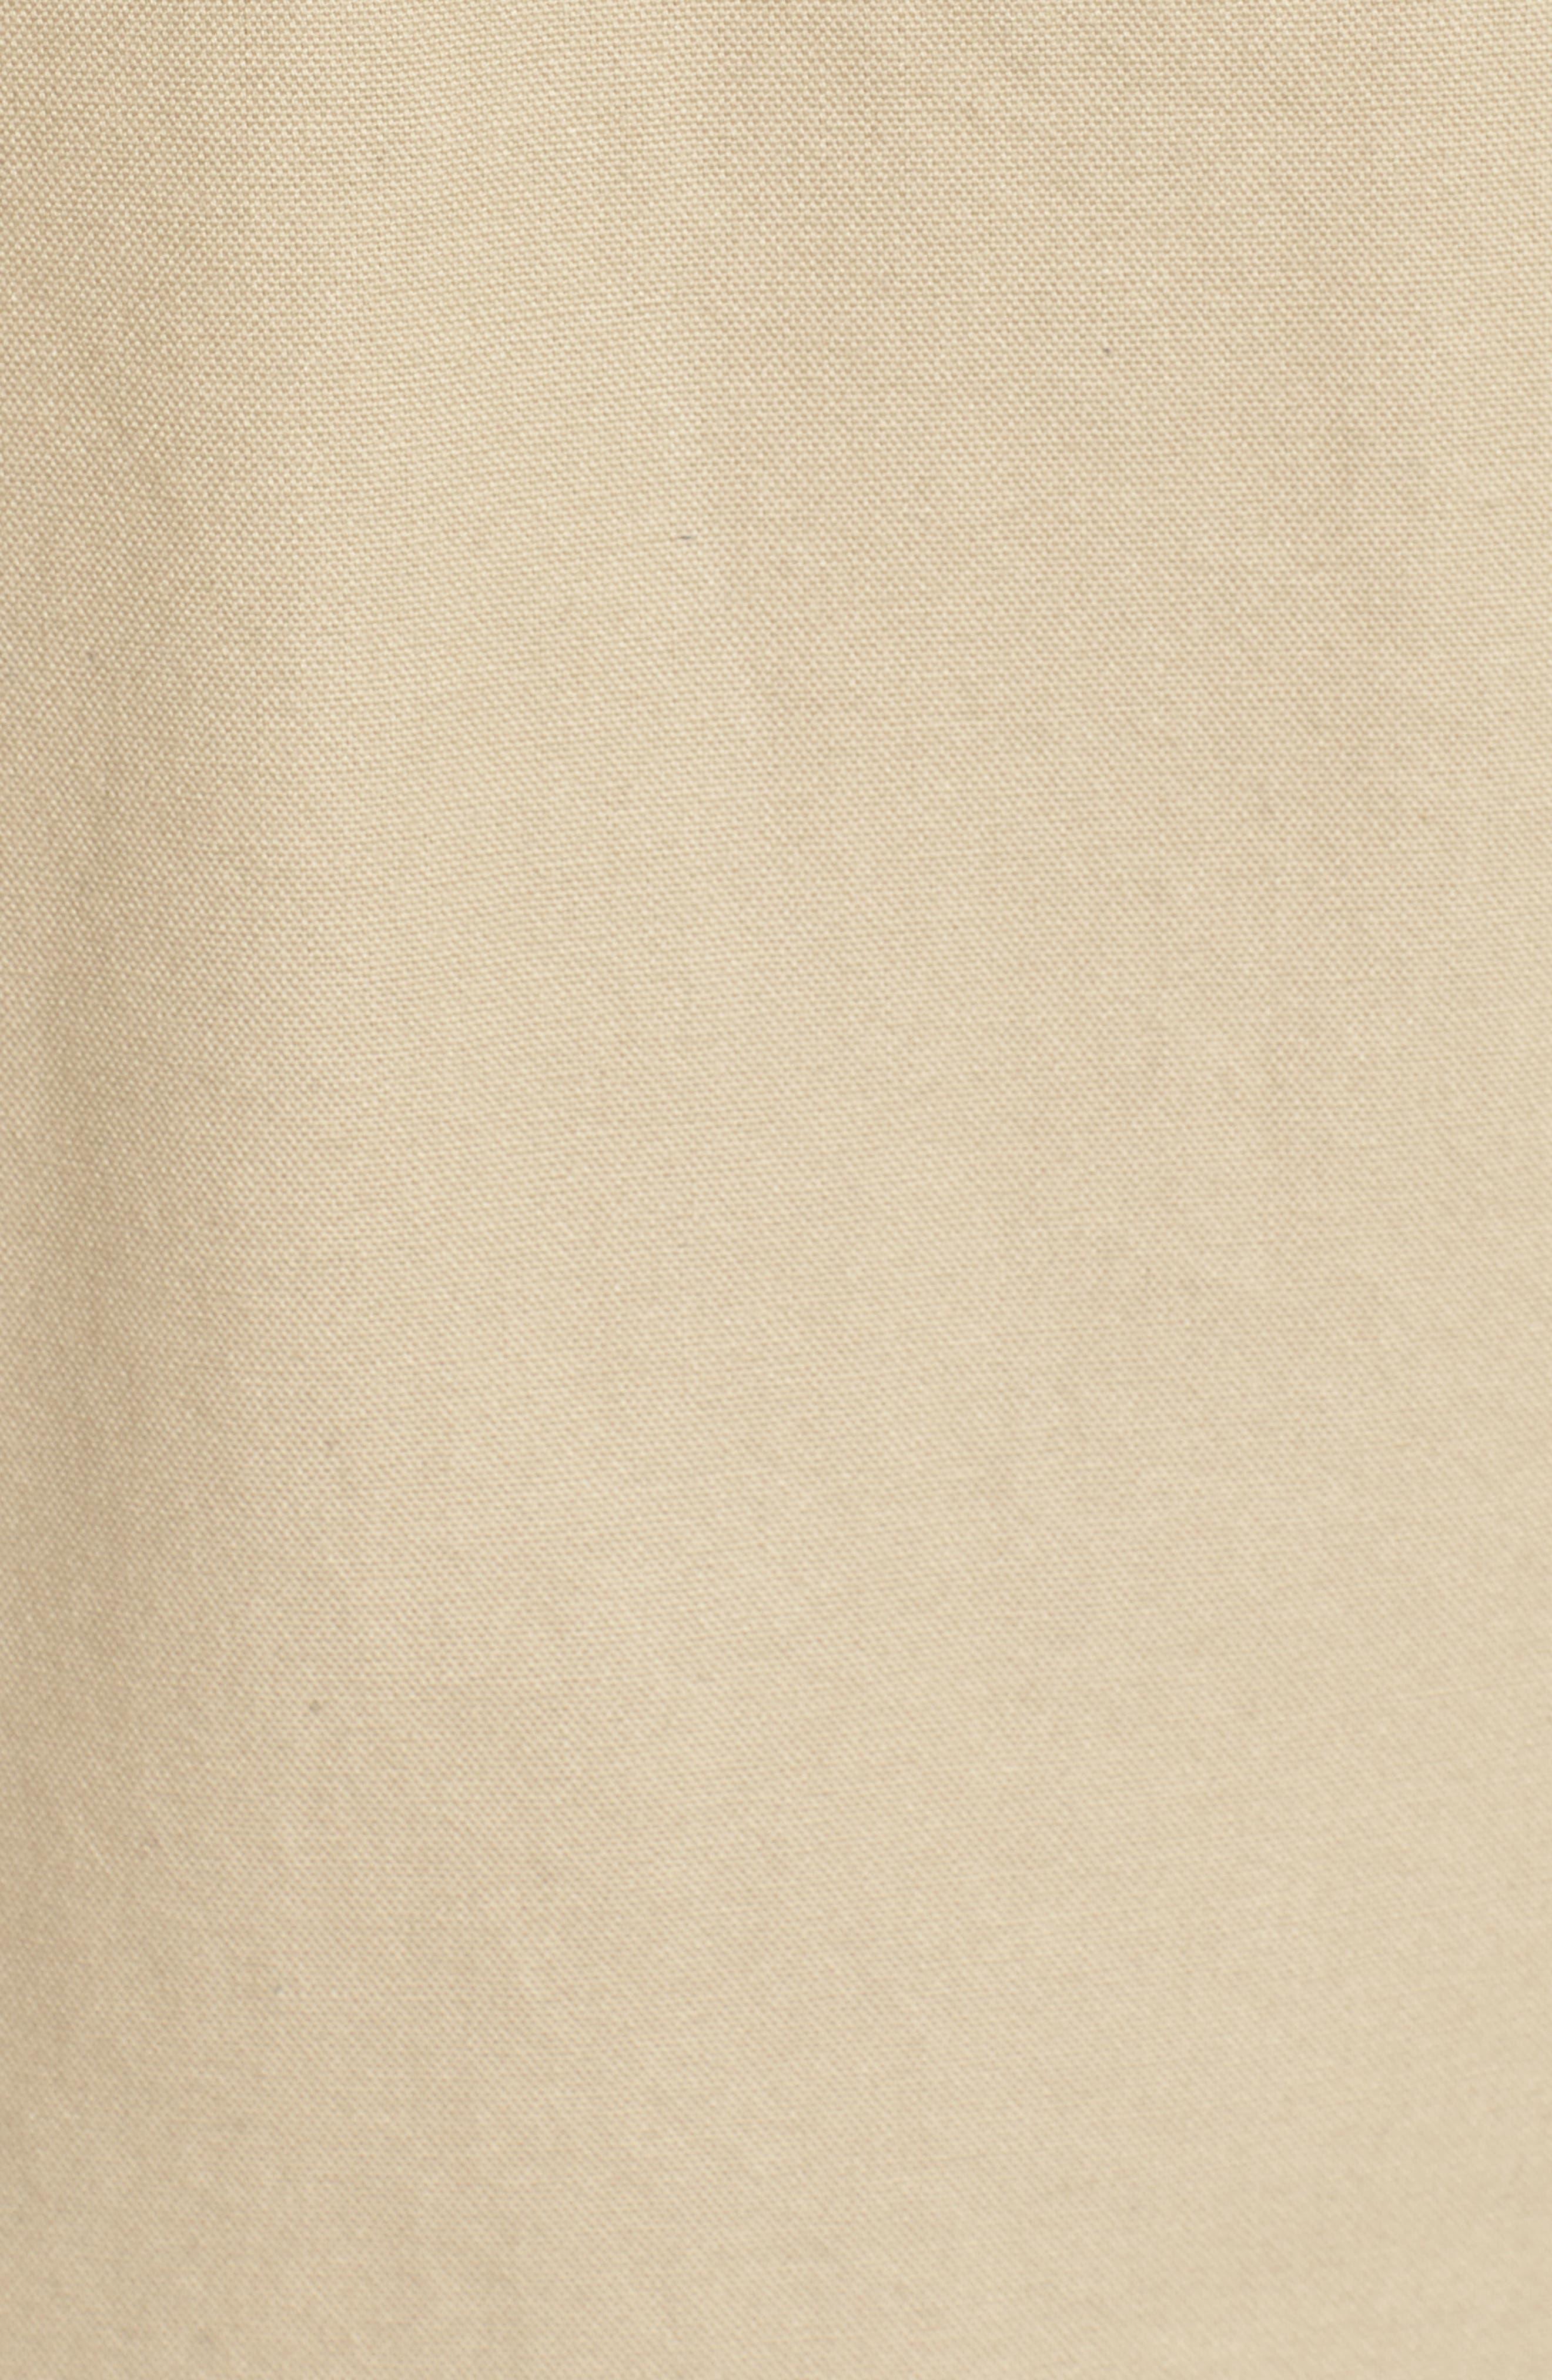 Colton Faux Shearling Trim Hooded Jacket,                             Alternate thumbnail 6, color,                             251